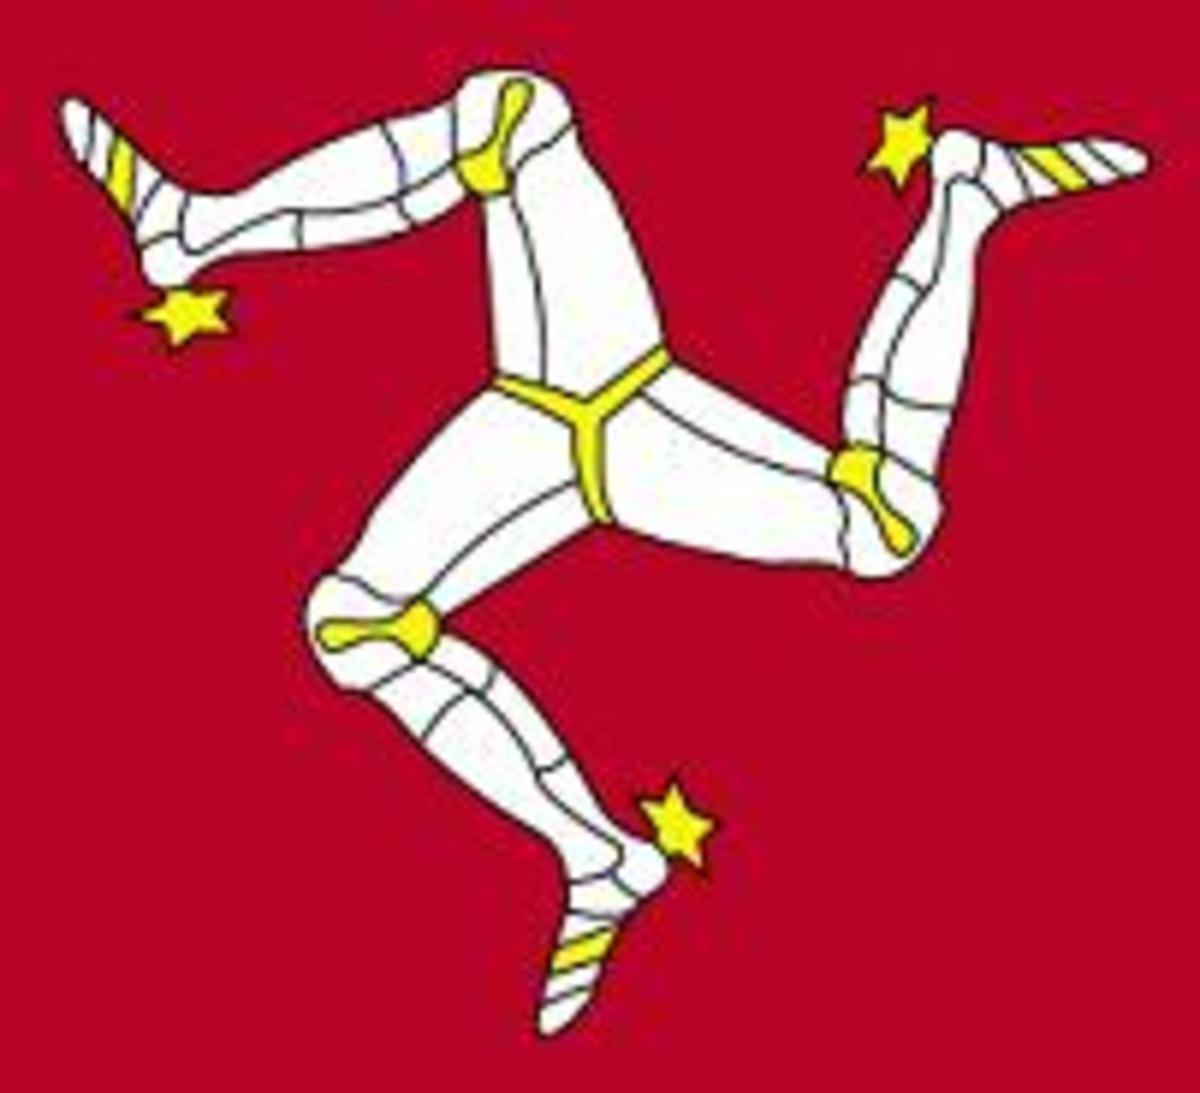 Manx Flag - a triskelion.